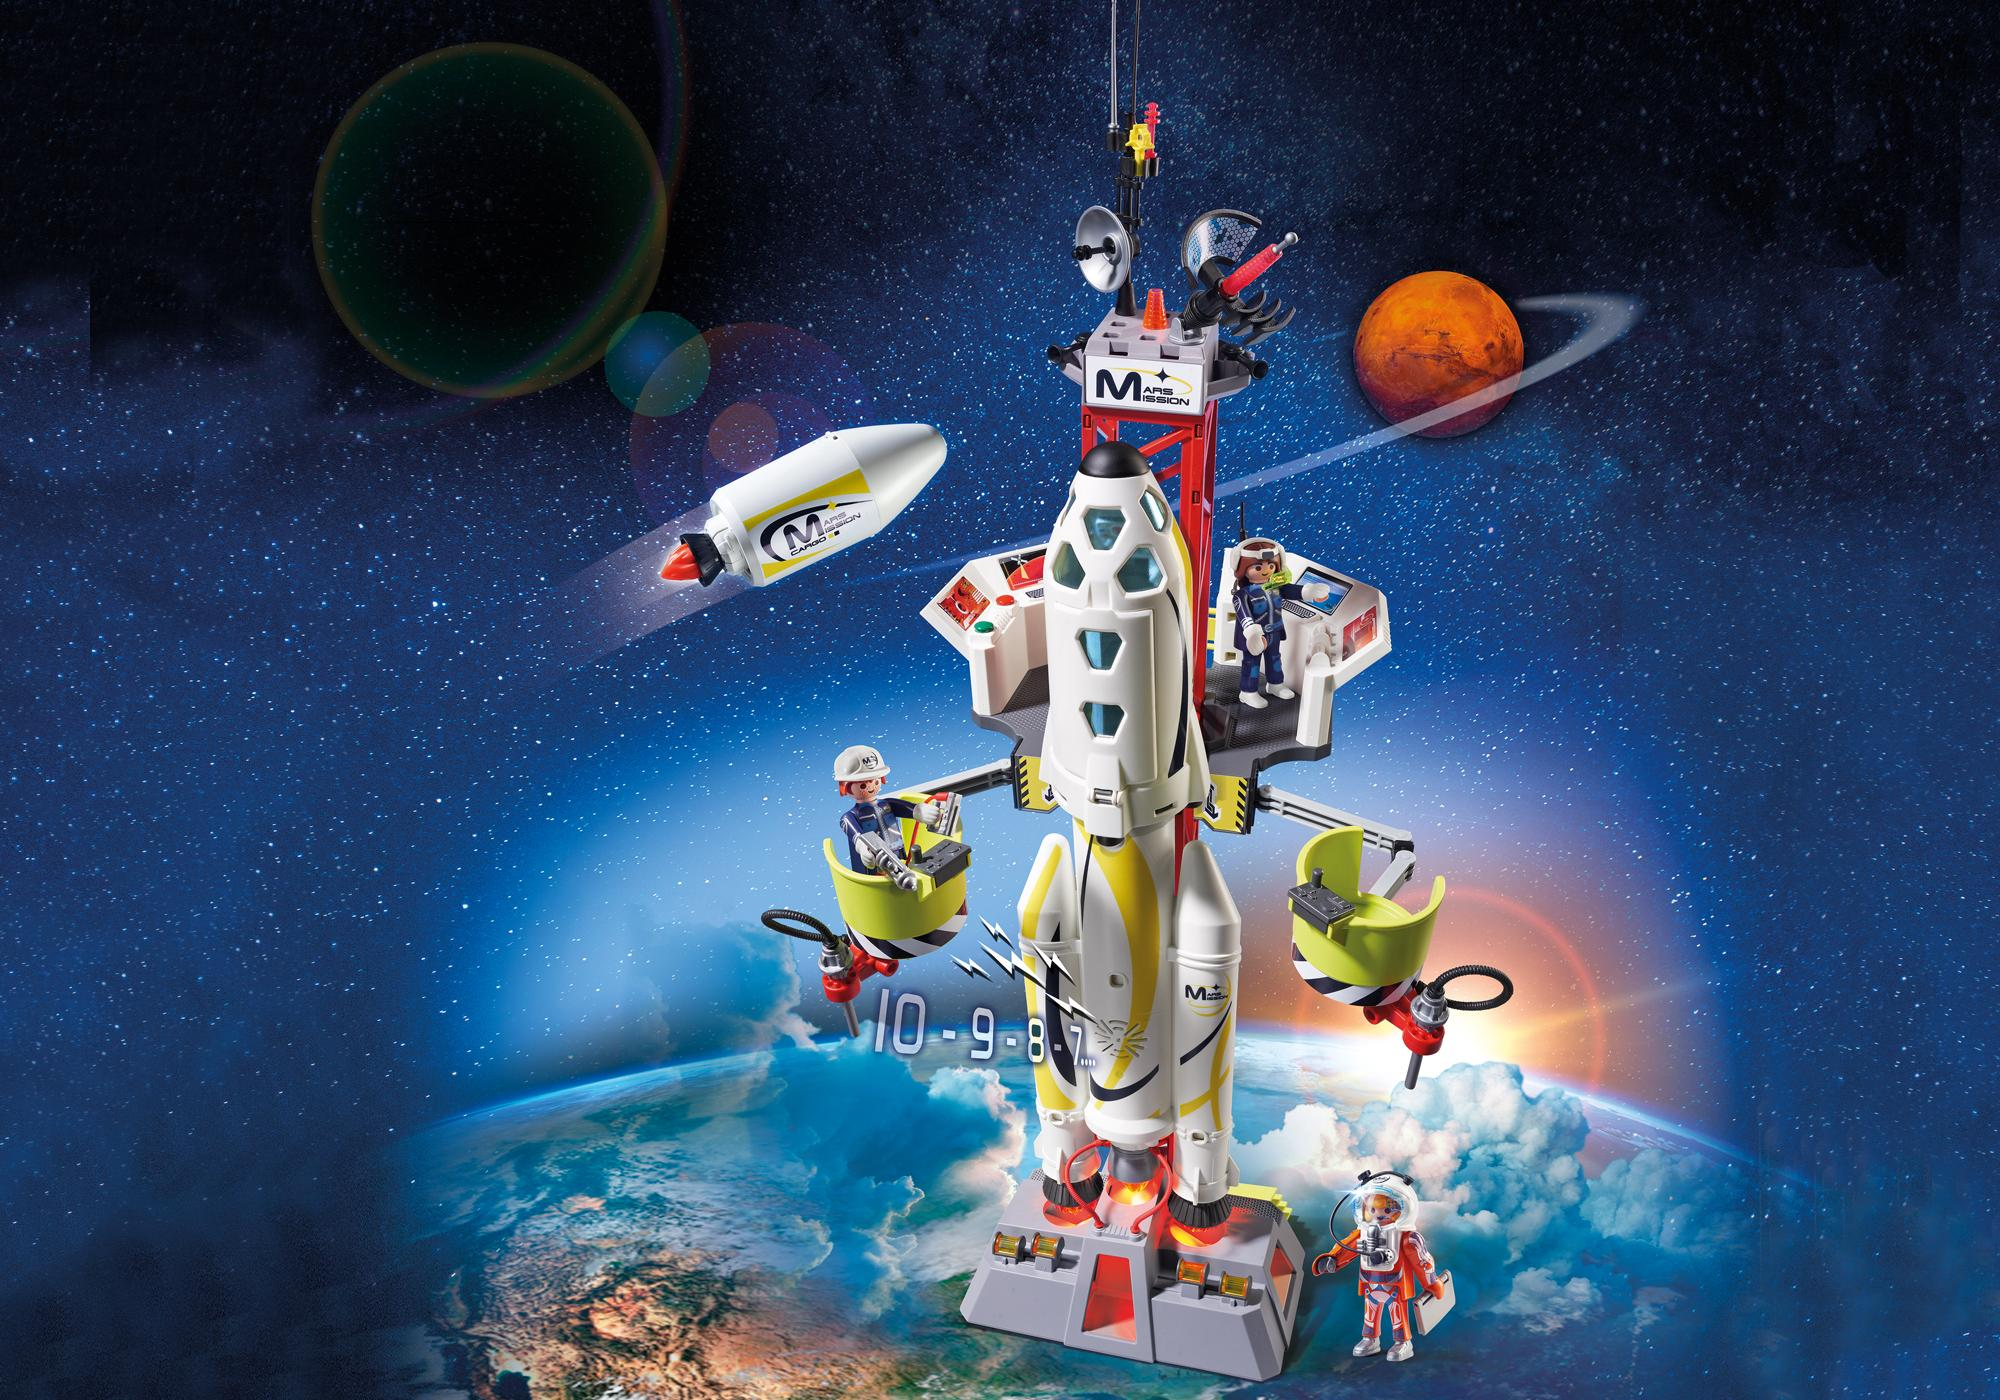 http://media.playmobil.com/i/playmobil/9488_product_detail/Razzo spaziale con rampa di lancio